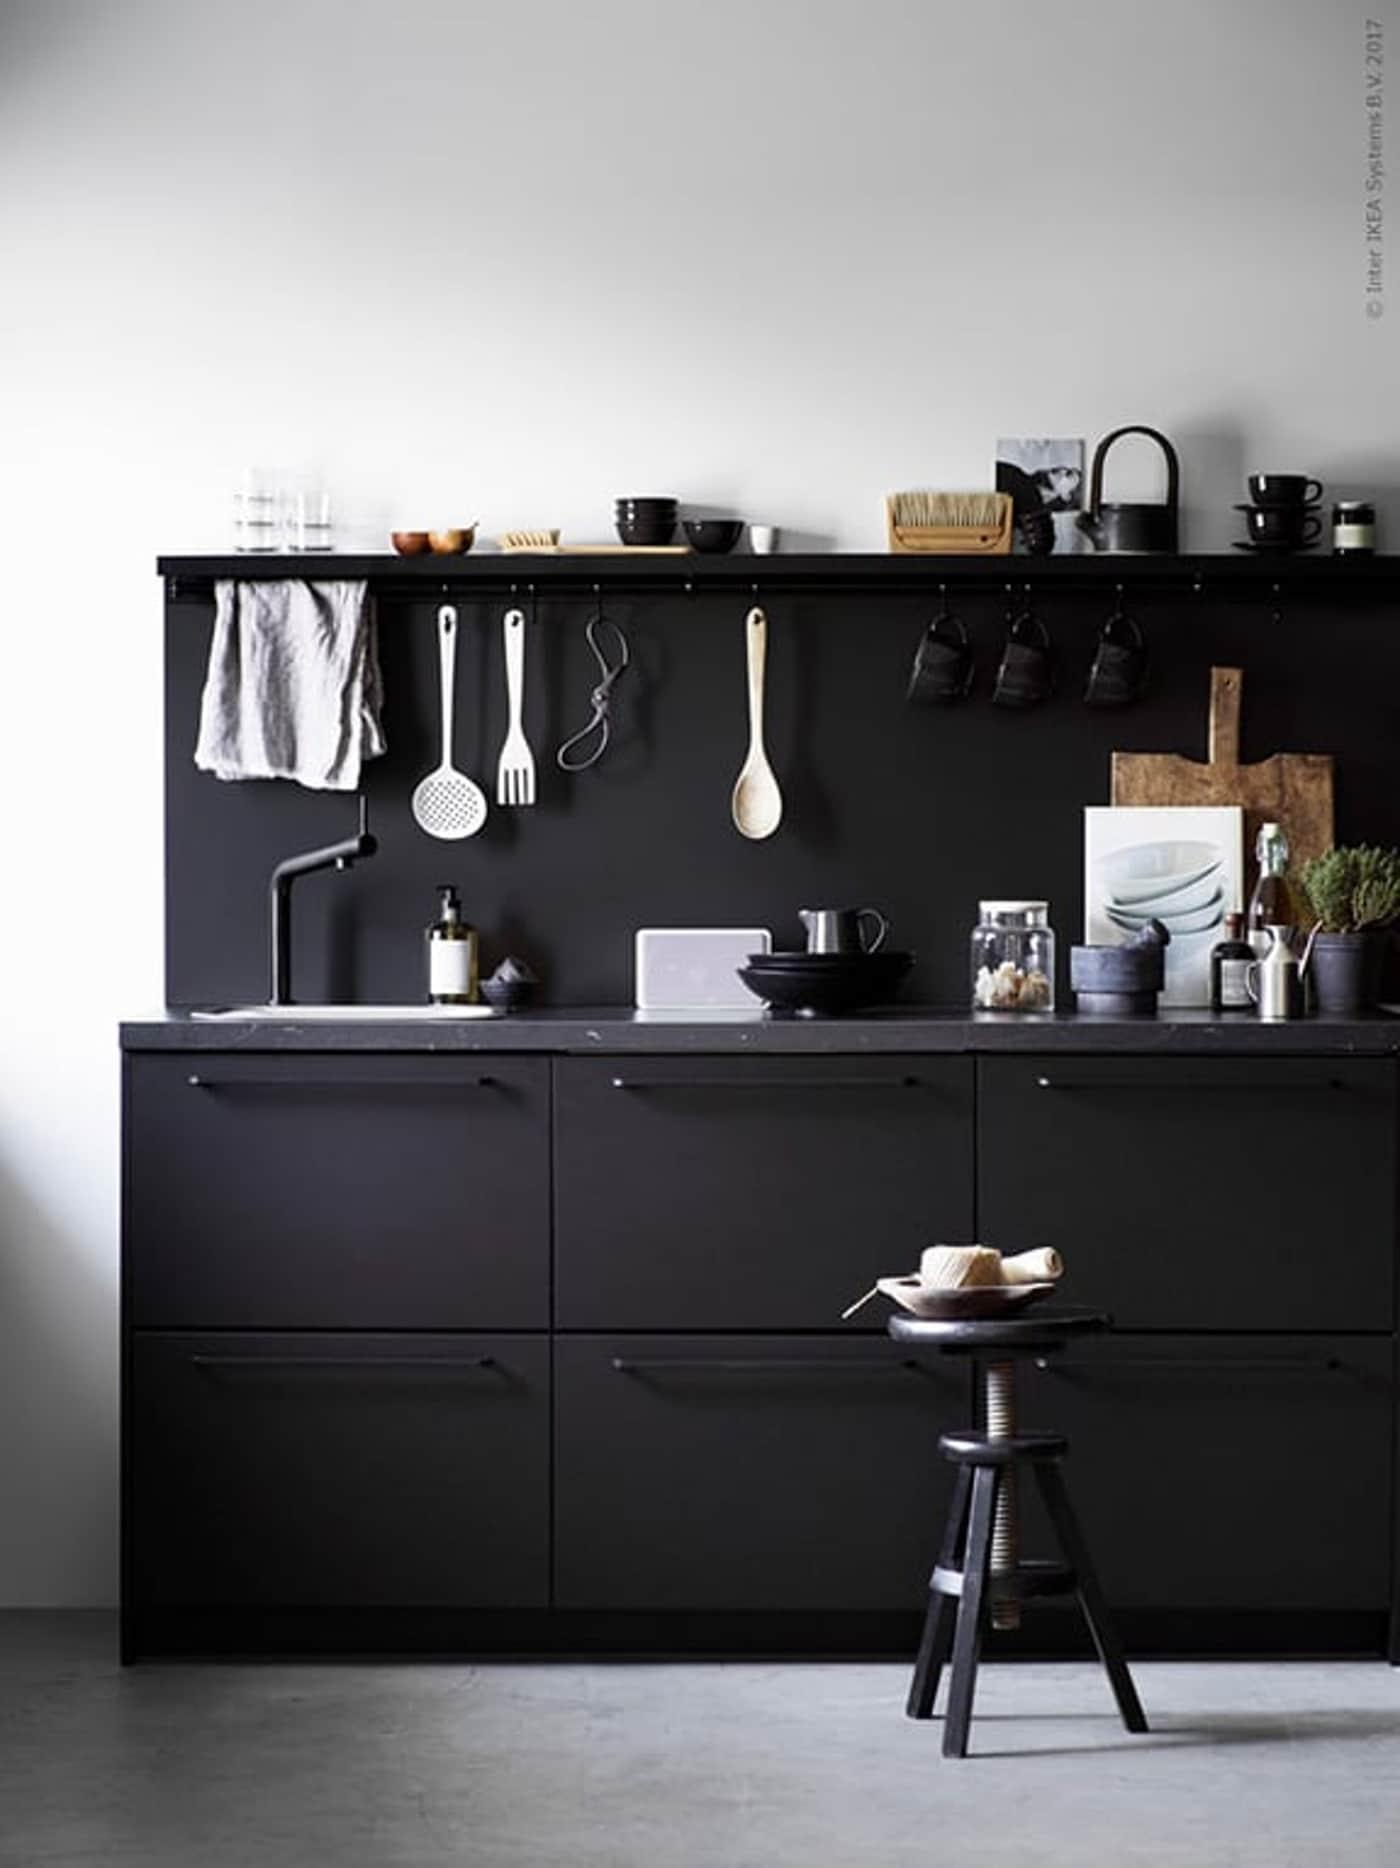 IKEA zwarte keuken met keukenaccessoires en kruk